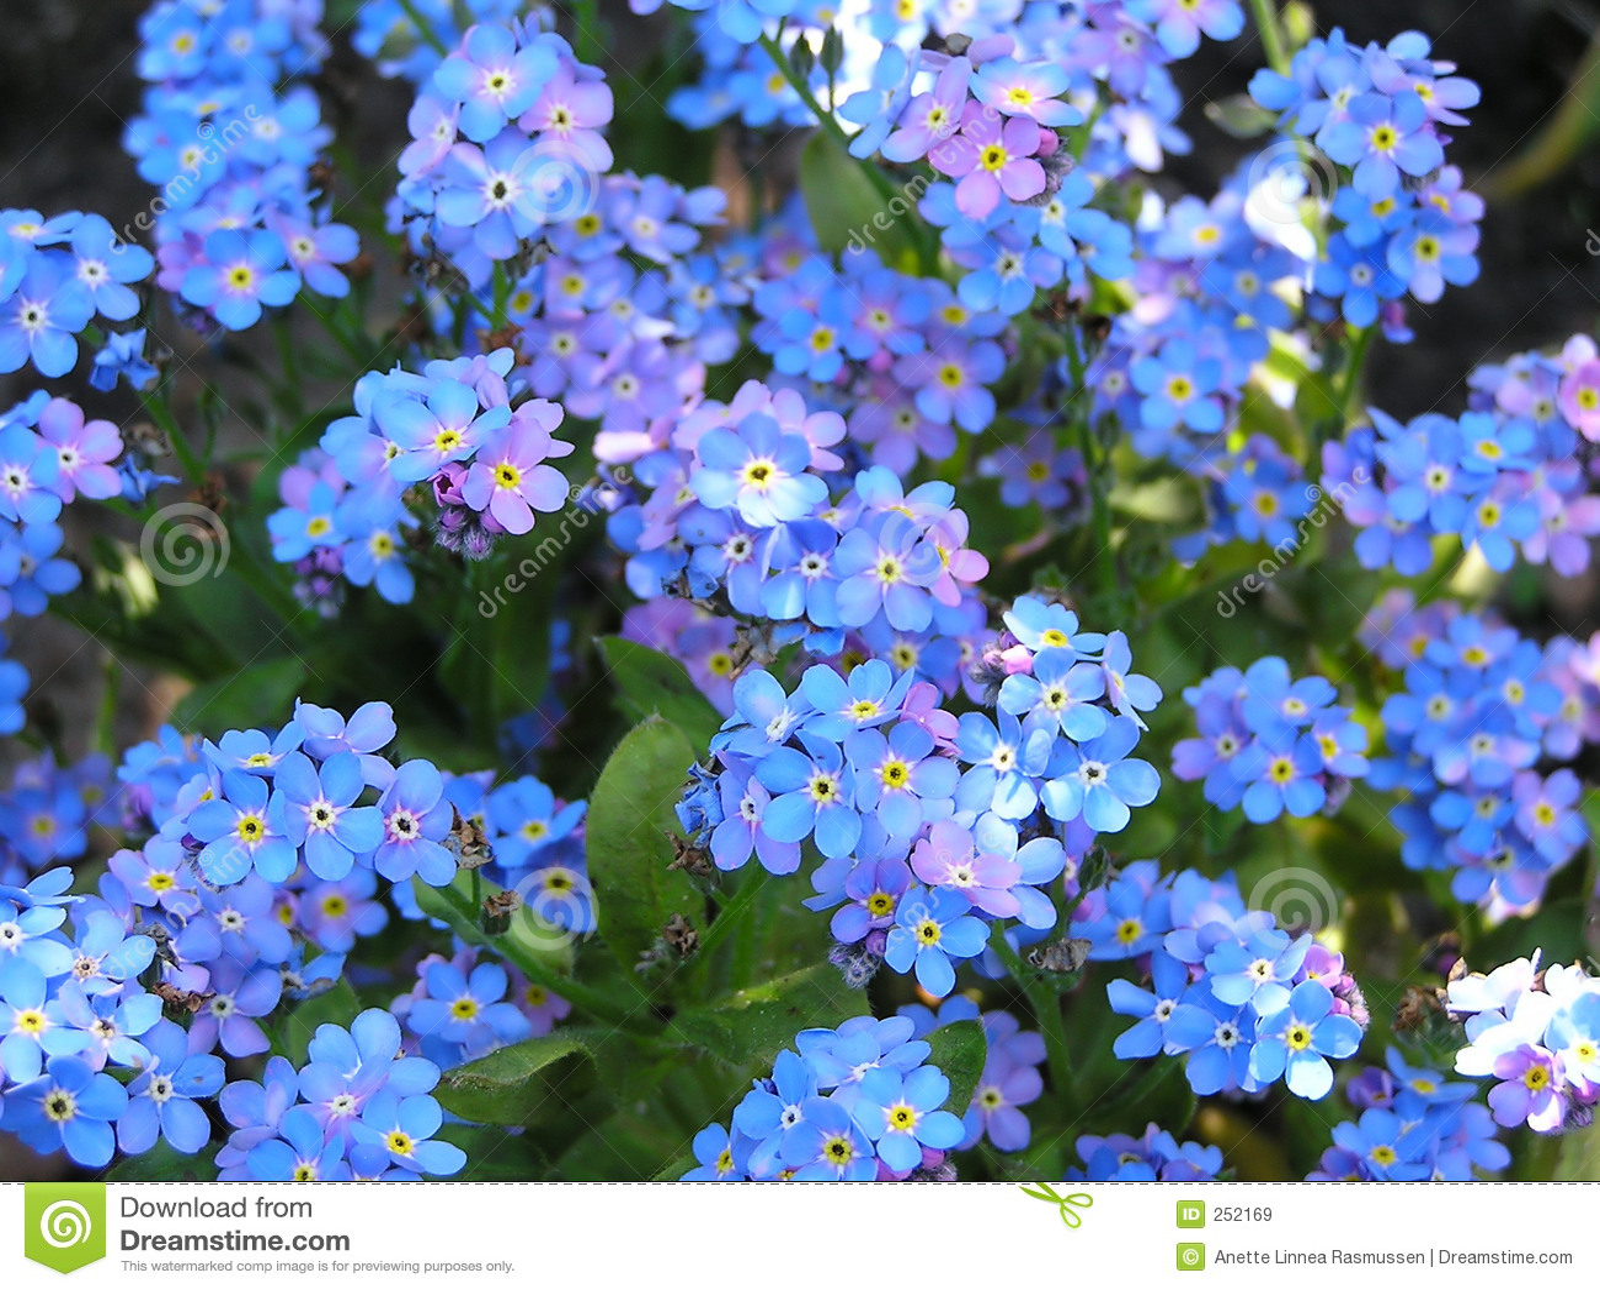 Цветы с синими цветами : названия, описание, фото 97